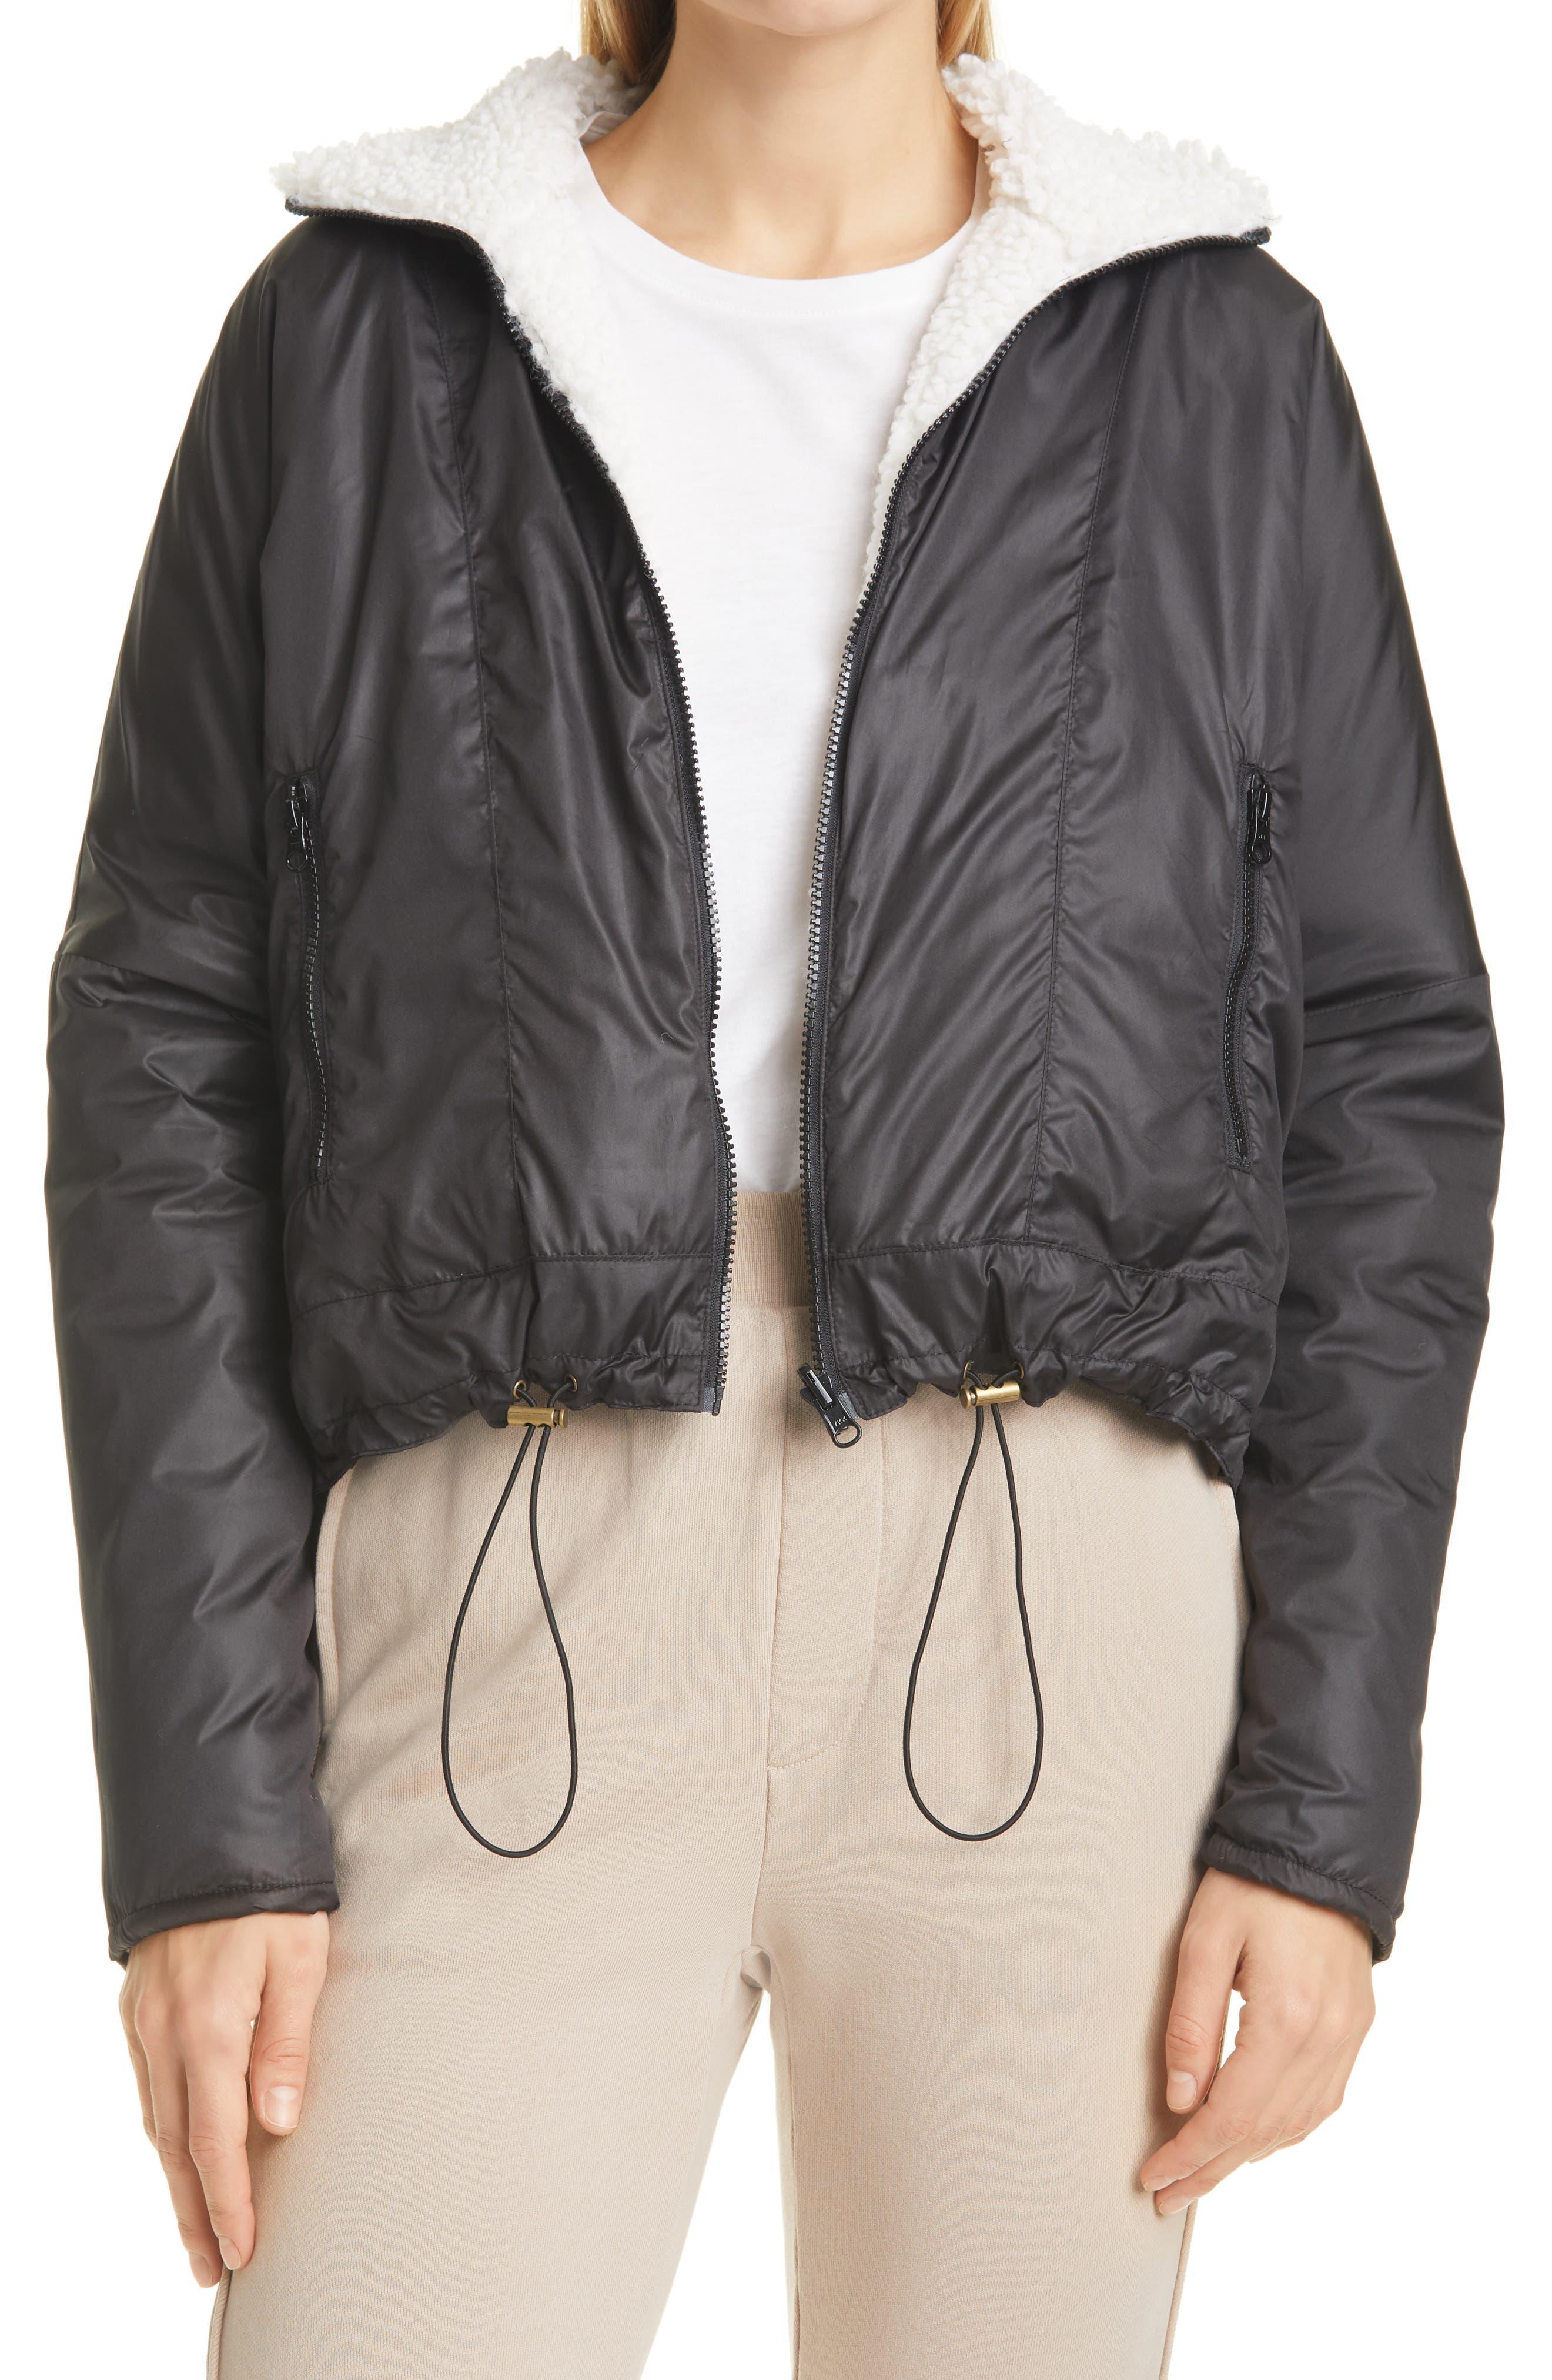 NSF Clothing Women's Nsf Clothing Dani Women's Reversible Jacket, Size Large - Black